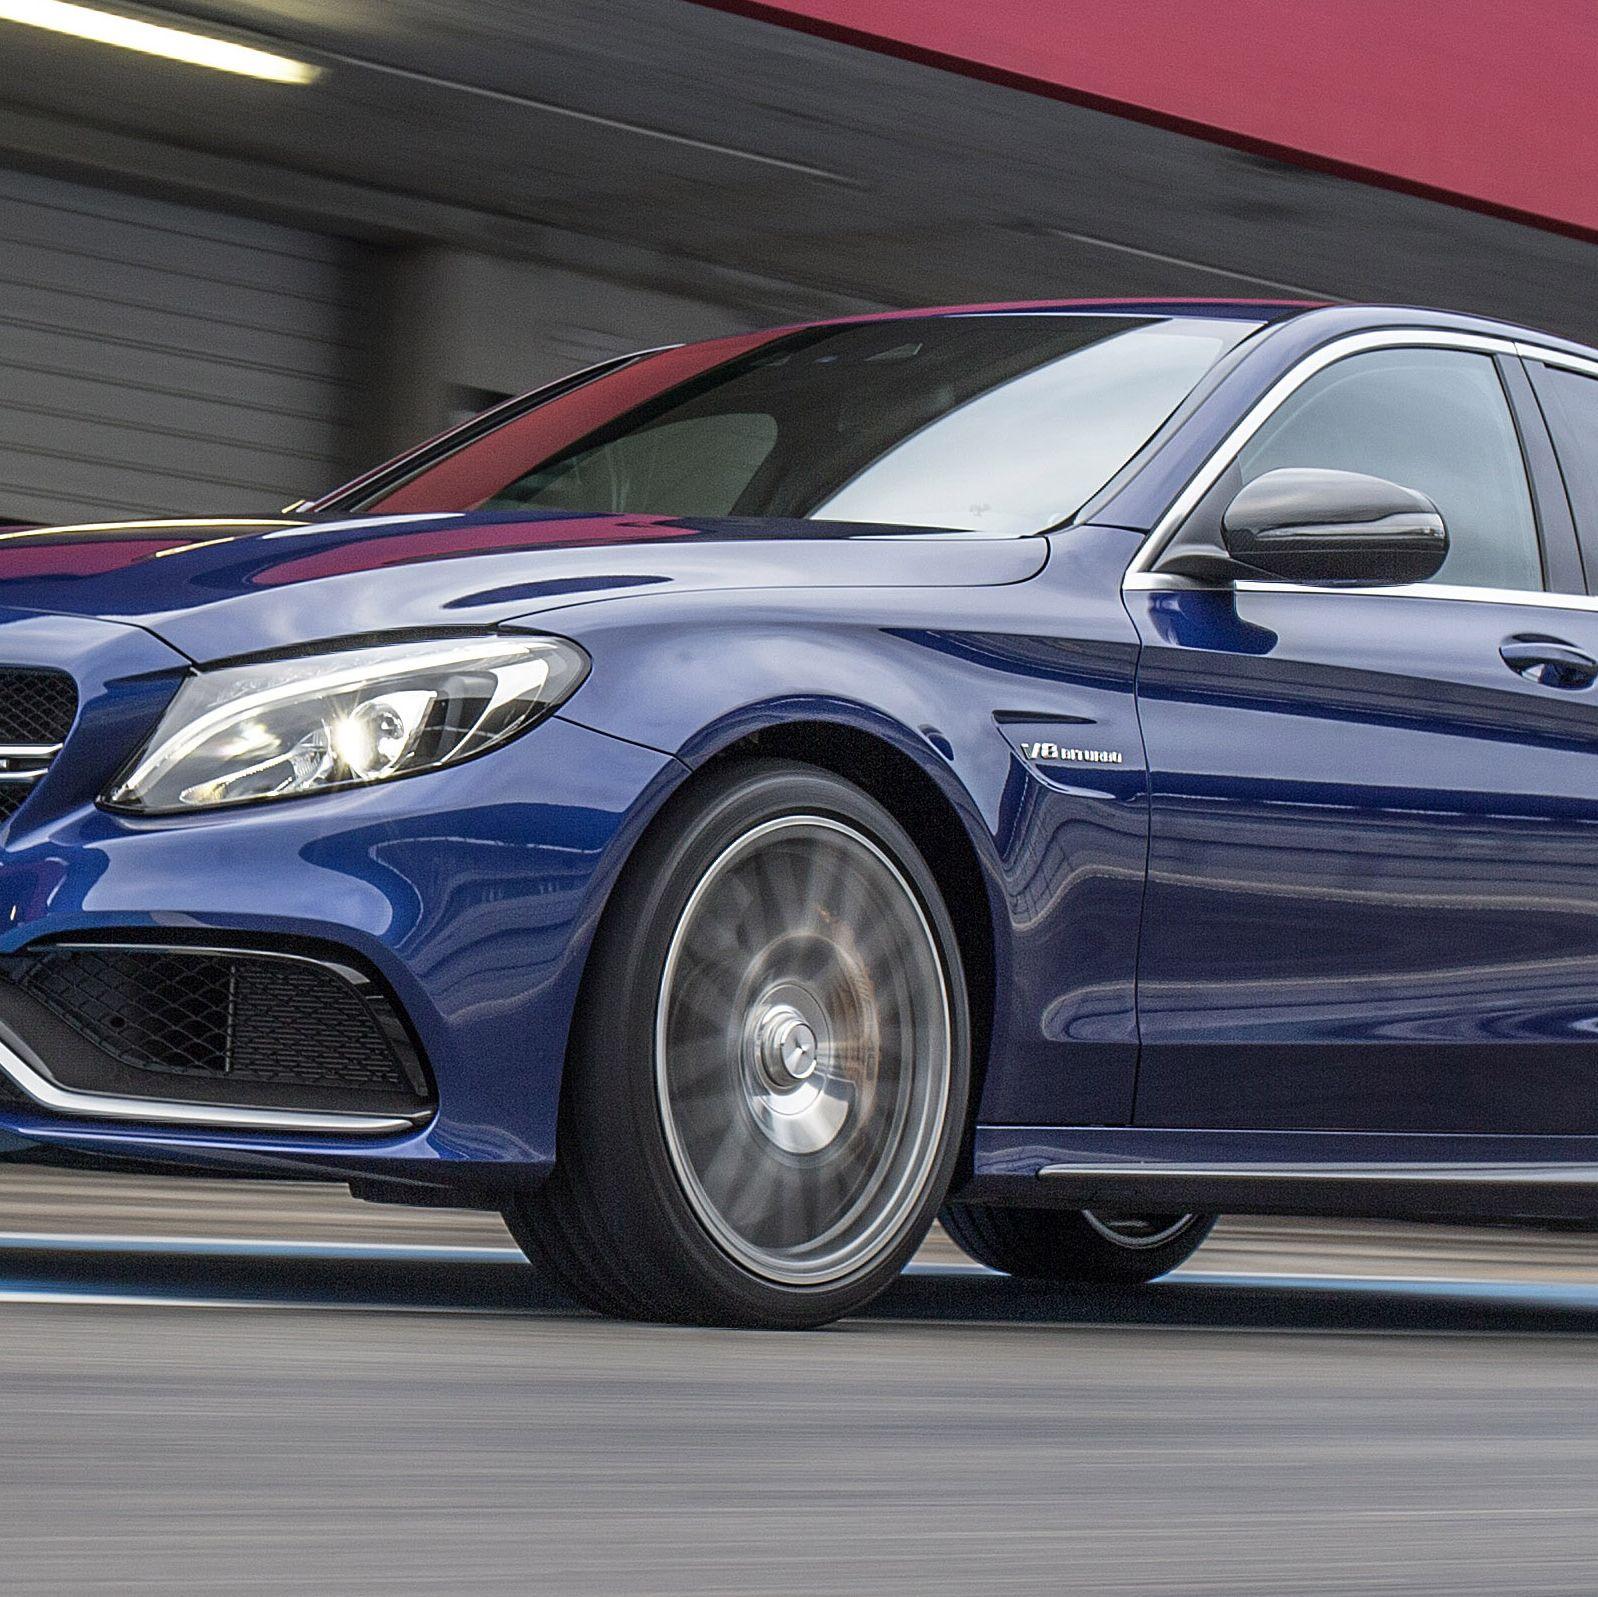 Mercedes-AMG C 63 S&#x3B; Fahrvorstellung Portimao 2015&#x3B; brillantblau metallic&#x3B; Leder Nappa schwarz